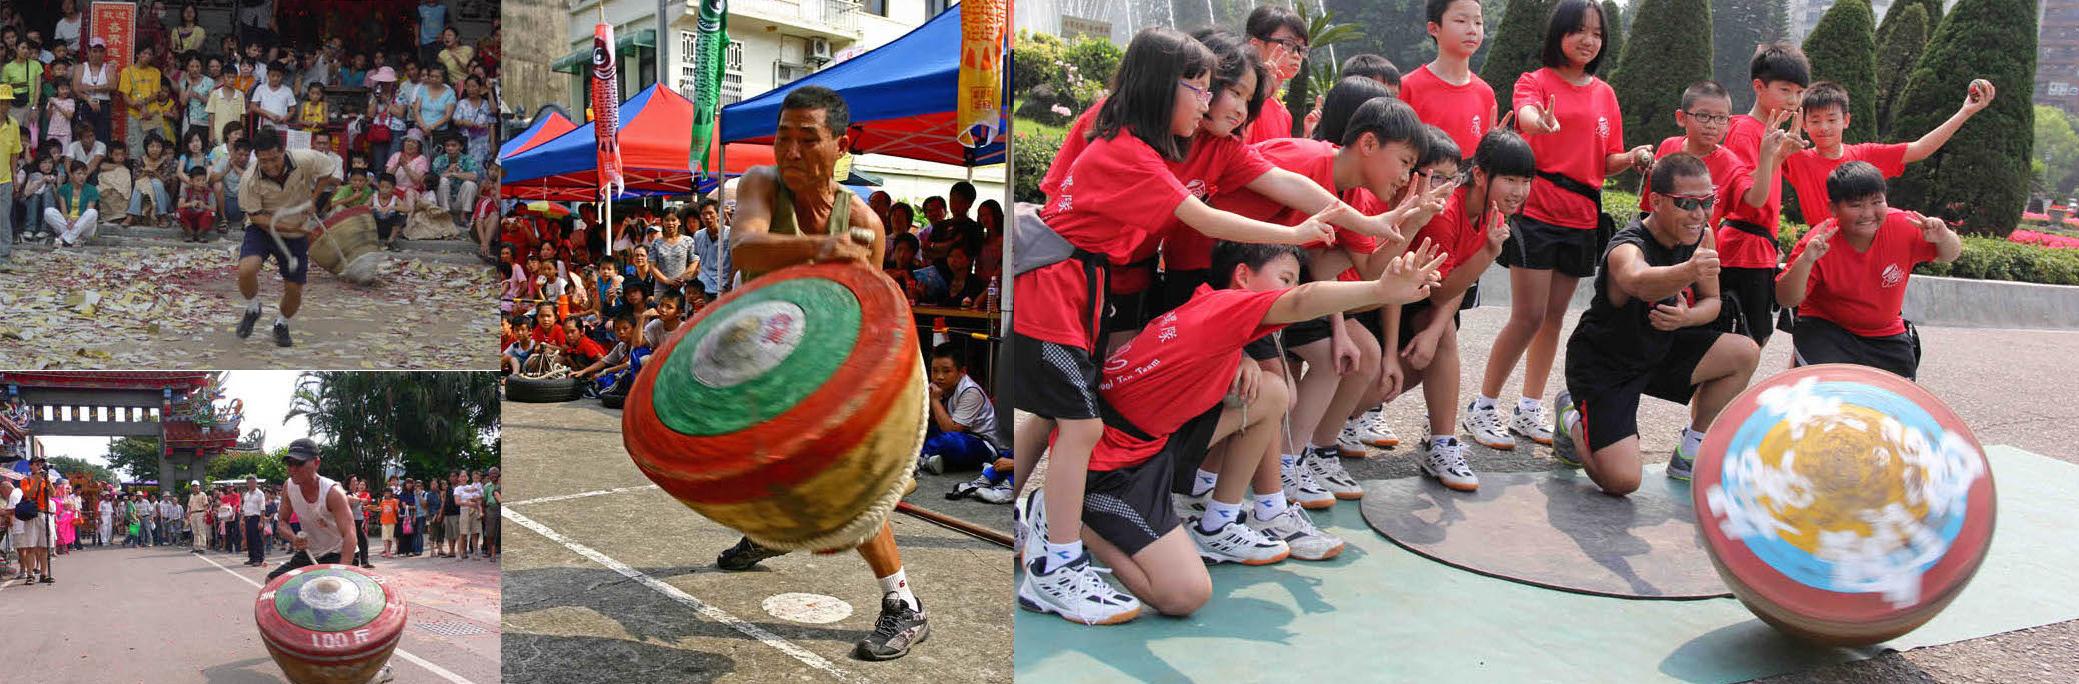 Introduction, Mr. Jian-Wu Wu, The National Gyro Master in Taiwan